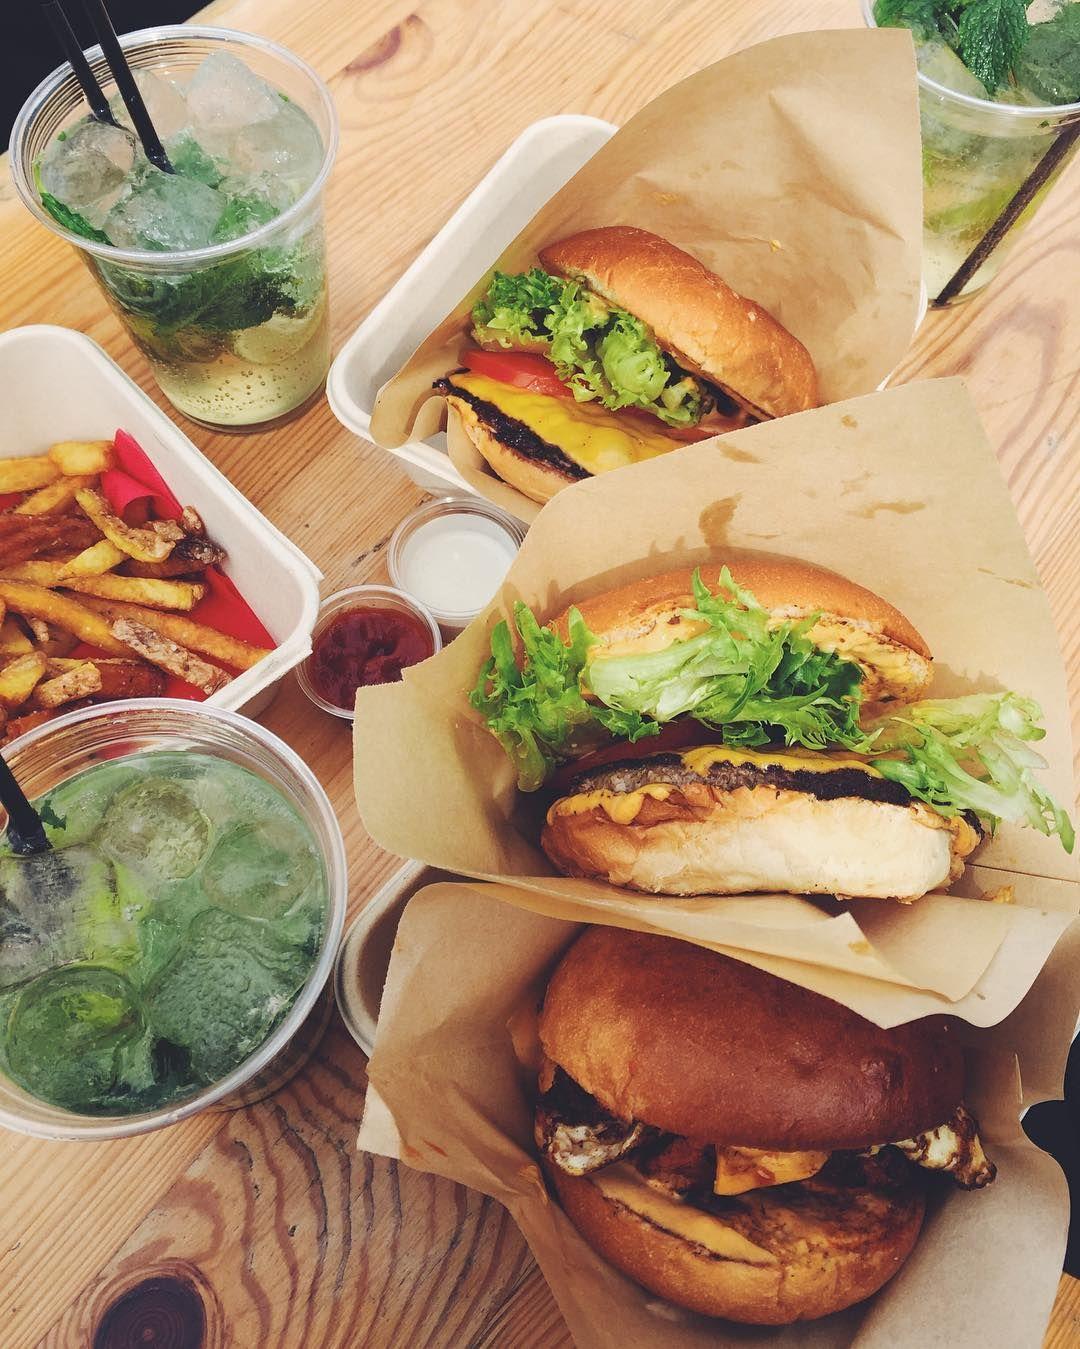 Instagram Photo By Kia Ellegaard Moller Apr 24 2016 At 11 23am Utc Burger And Fries Burger Food